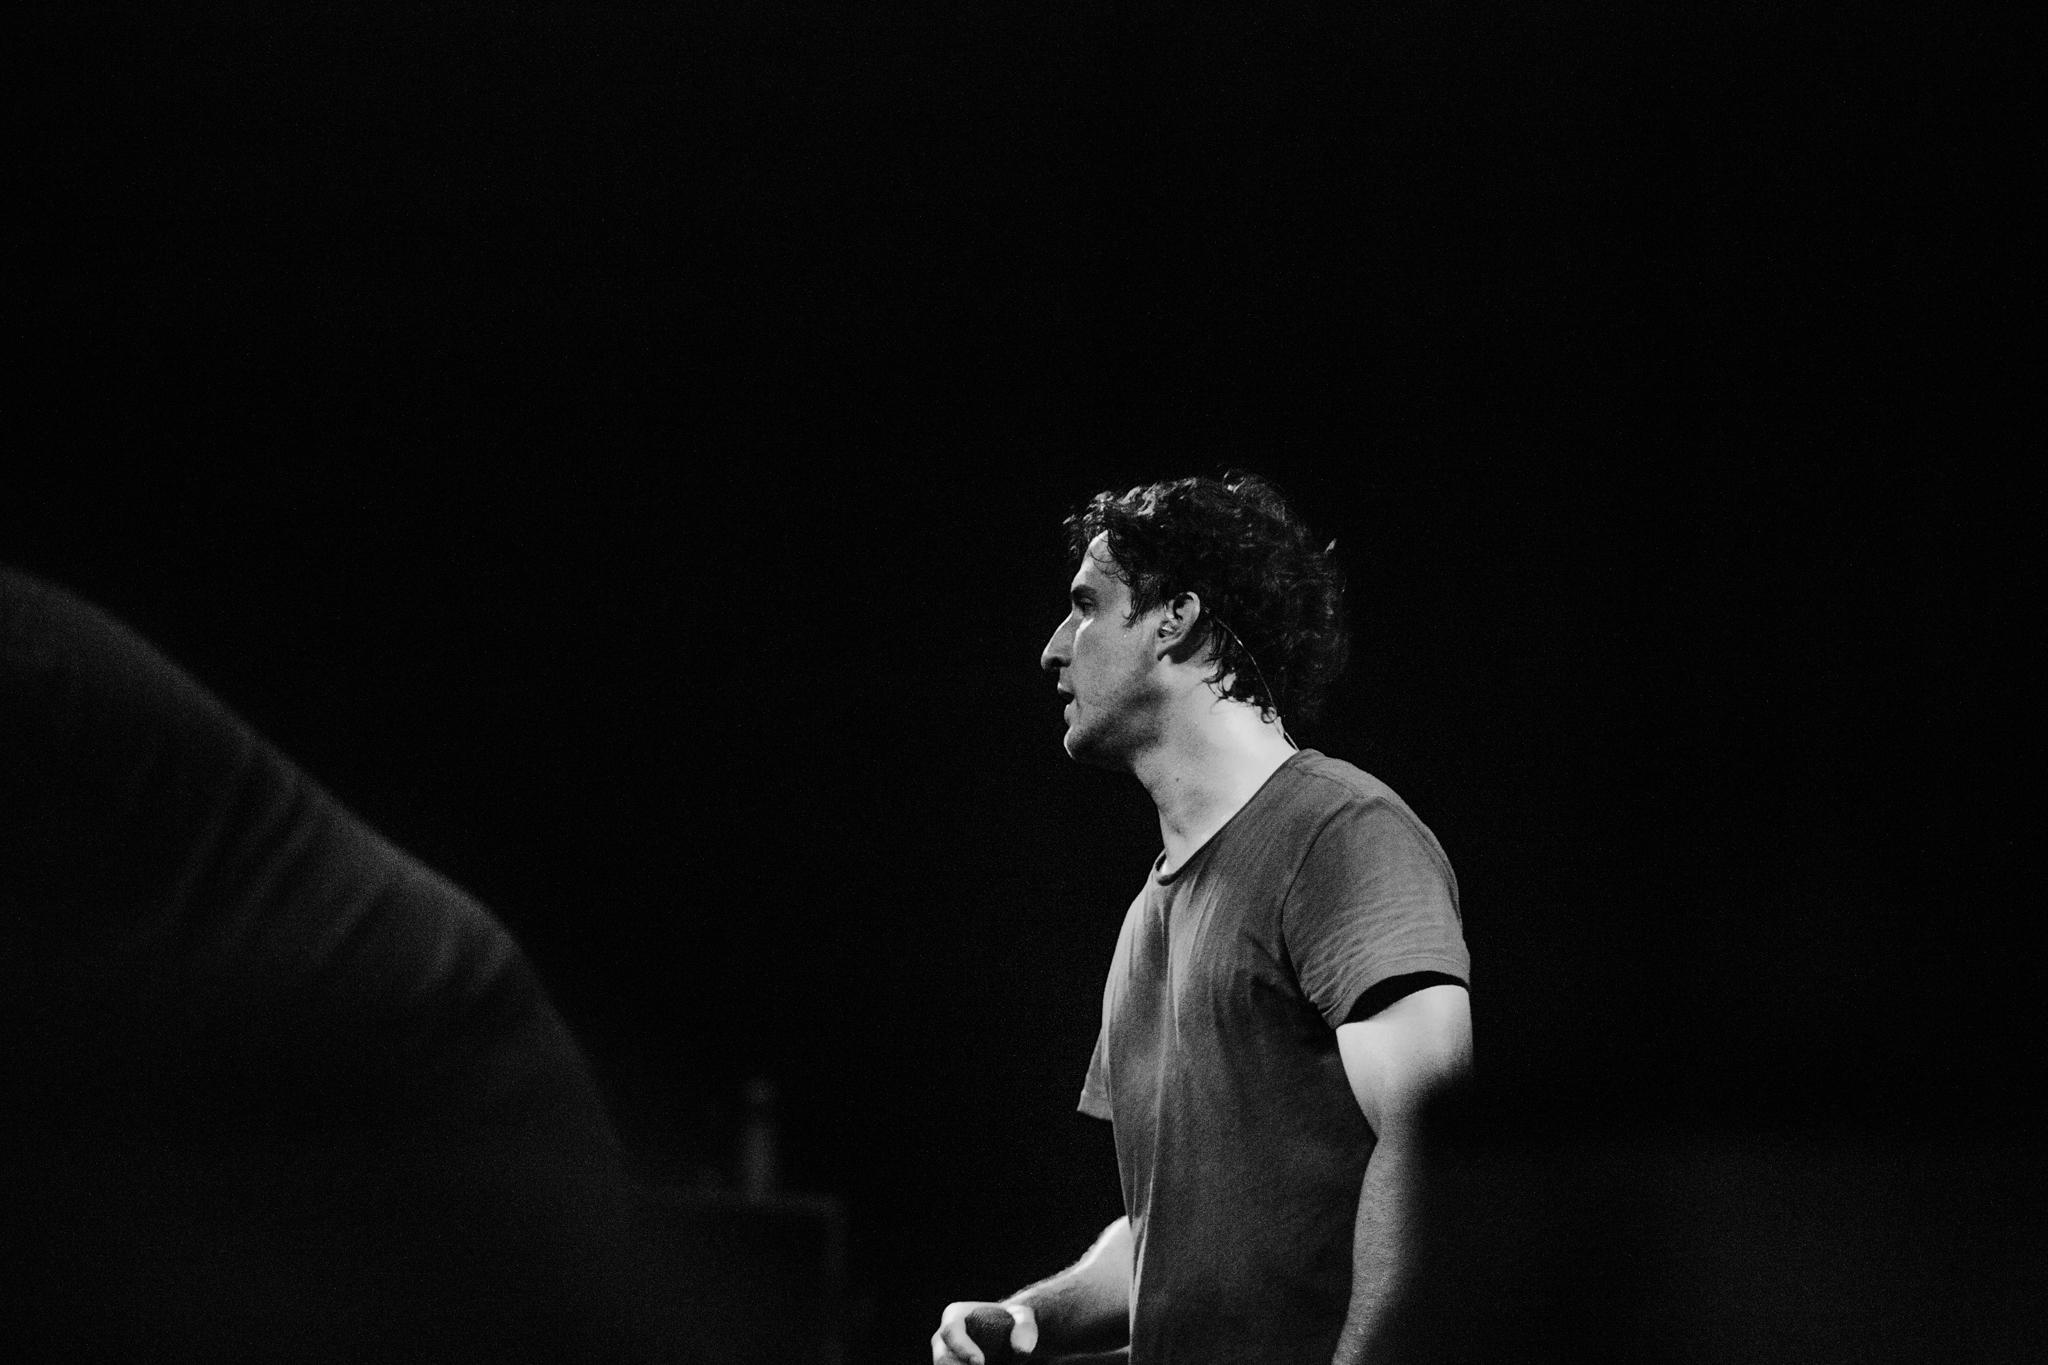 Lafferty Photo - Dance Gavin Dance 03.08.17-8434.jpg